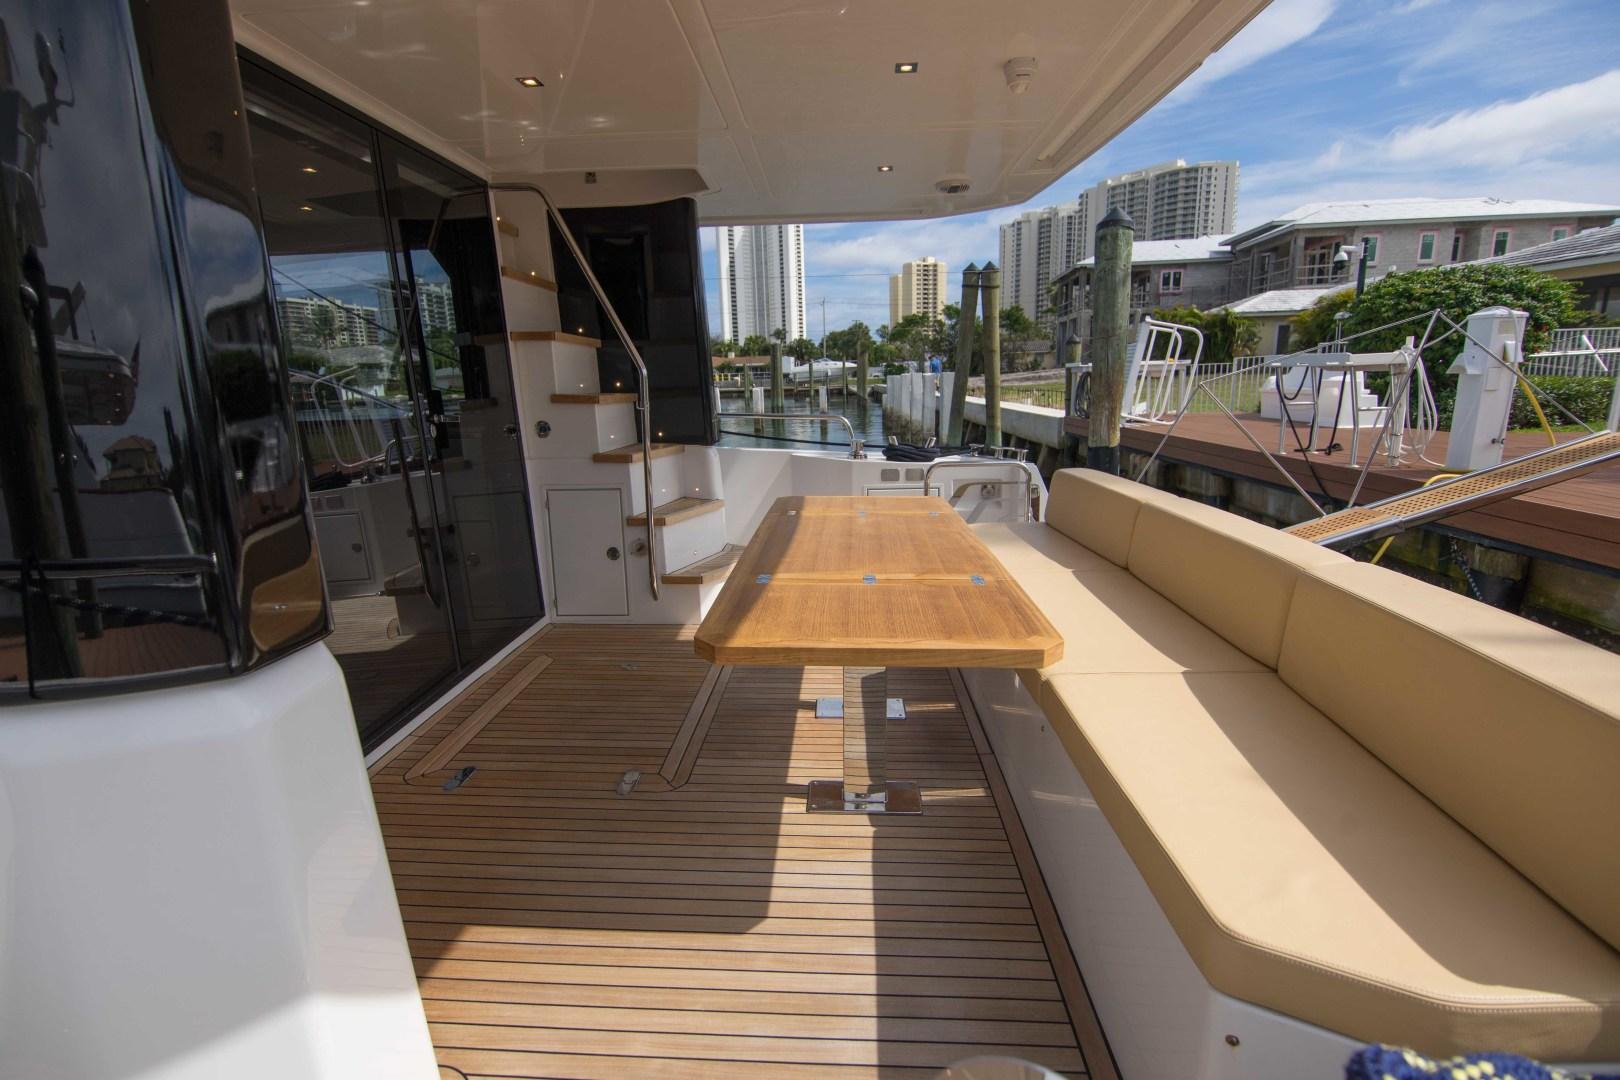 Sundeck-58 Sport 2019-LJ IV Singer Island-Florida-United States-Aft Deck-1373061 | Thumbnail